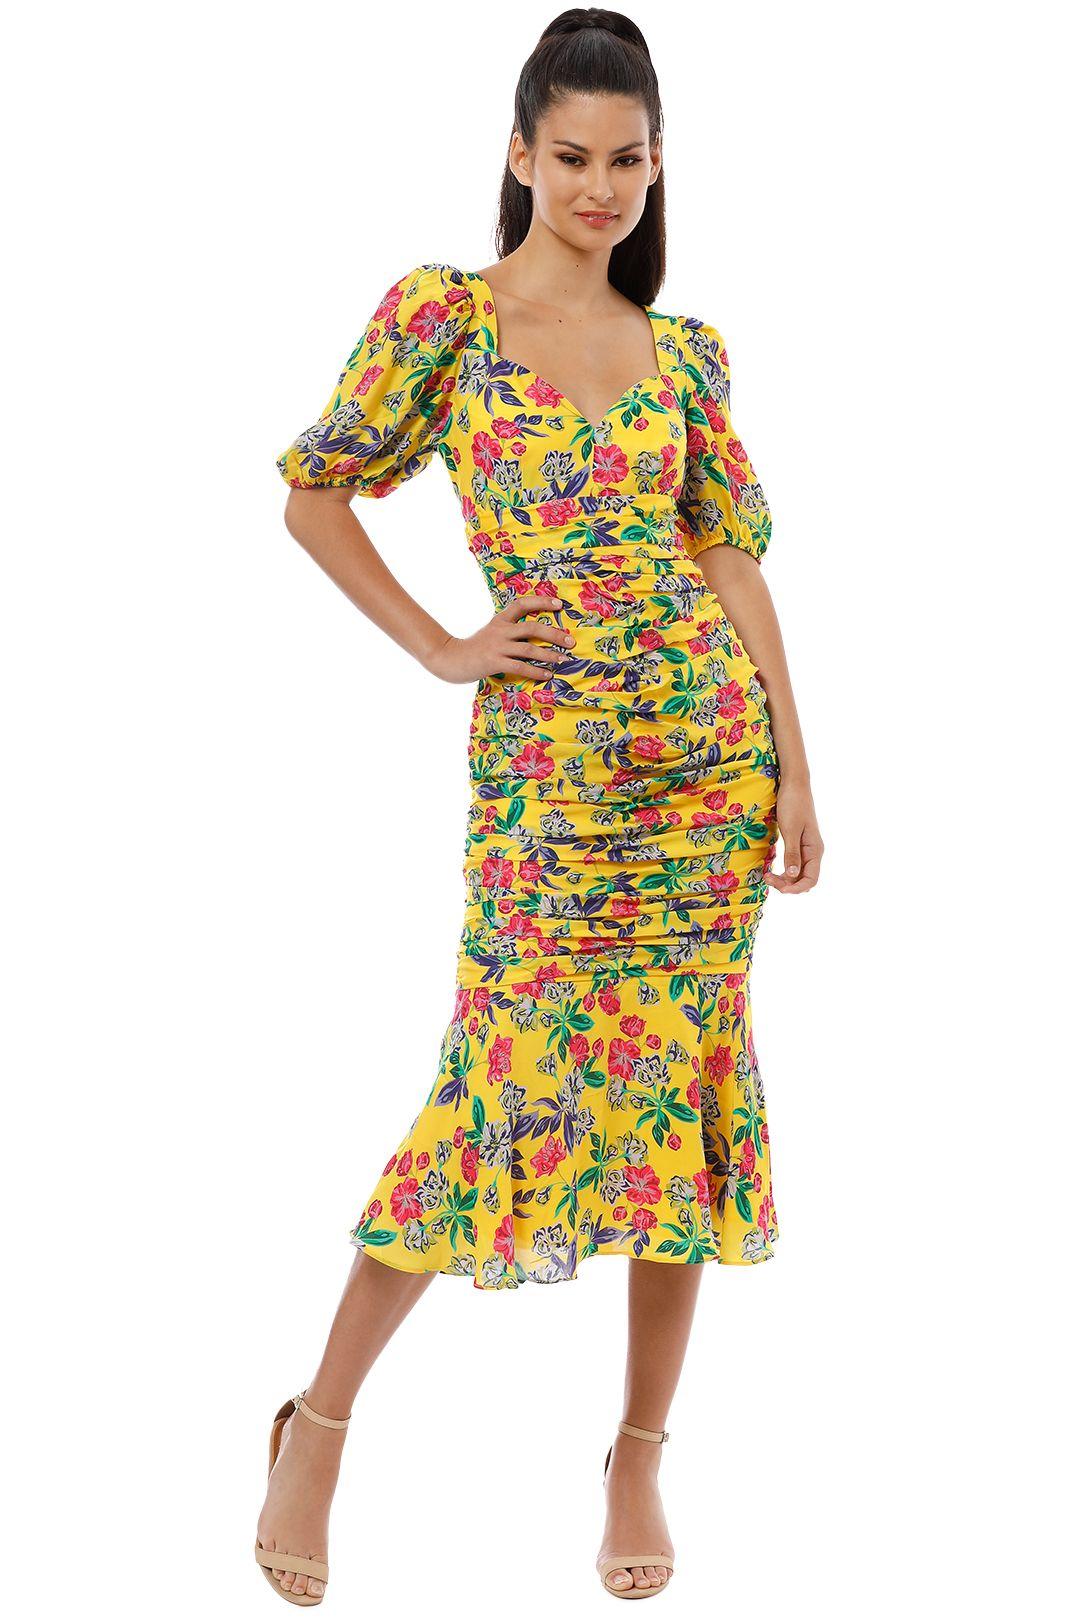 Talulah - Finch Midi Dress - Wildberry Sunrise - Front